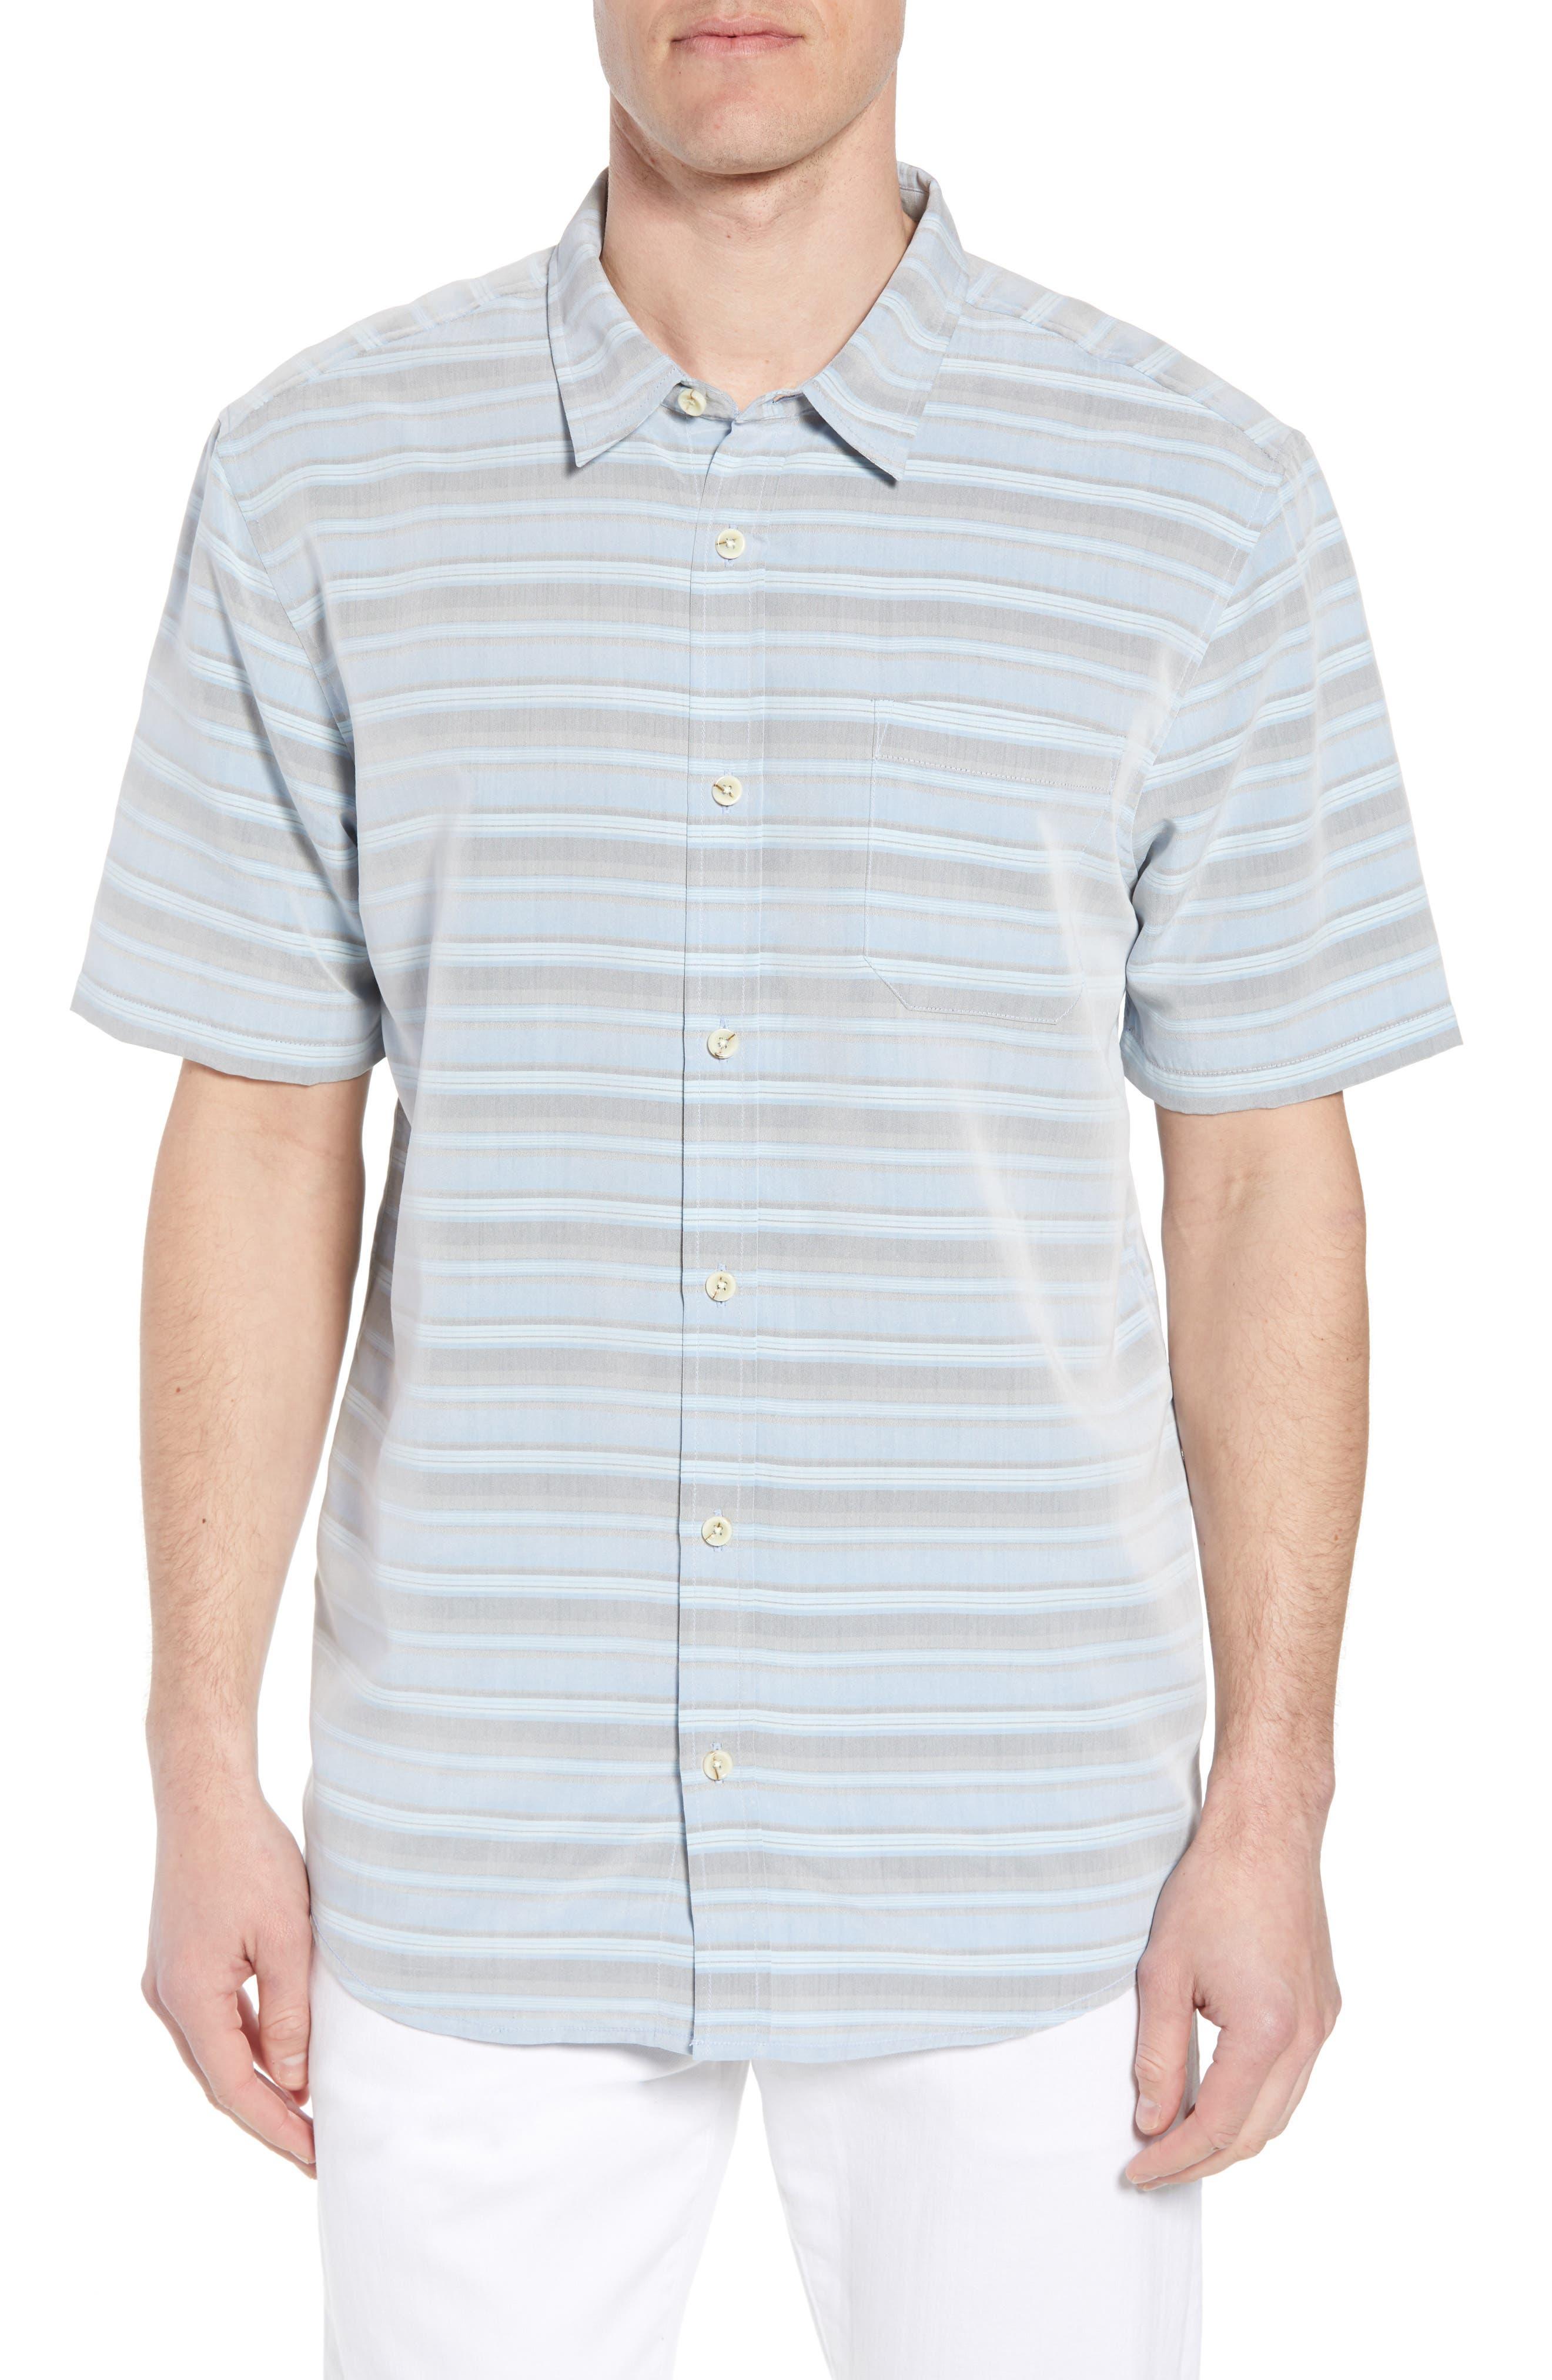 Tubes Regular Fit Short Sleeve Sport Shirt,                             Main thumbnail 1, color,                             COBALT